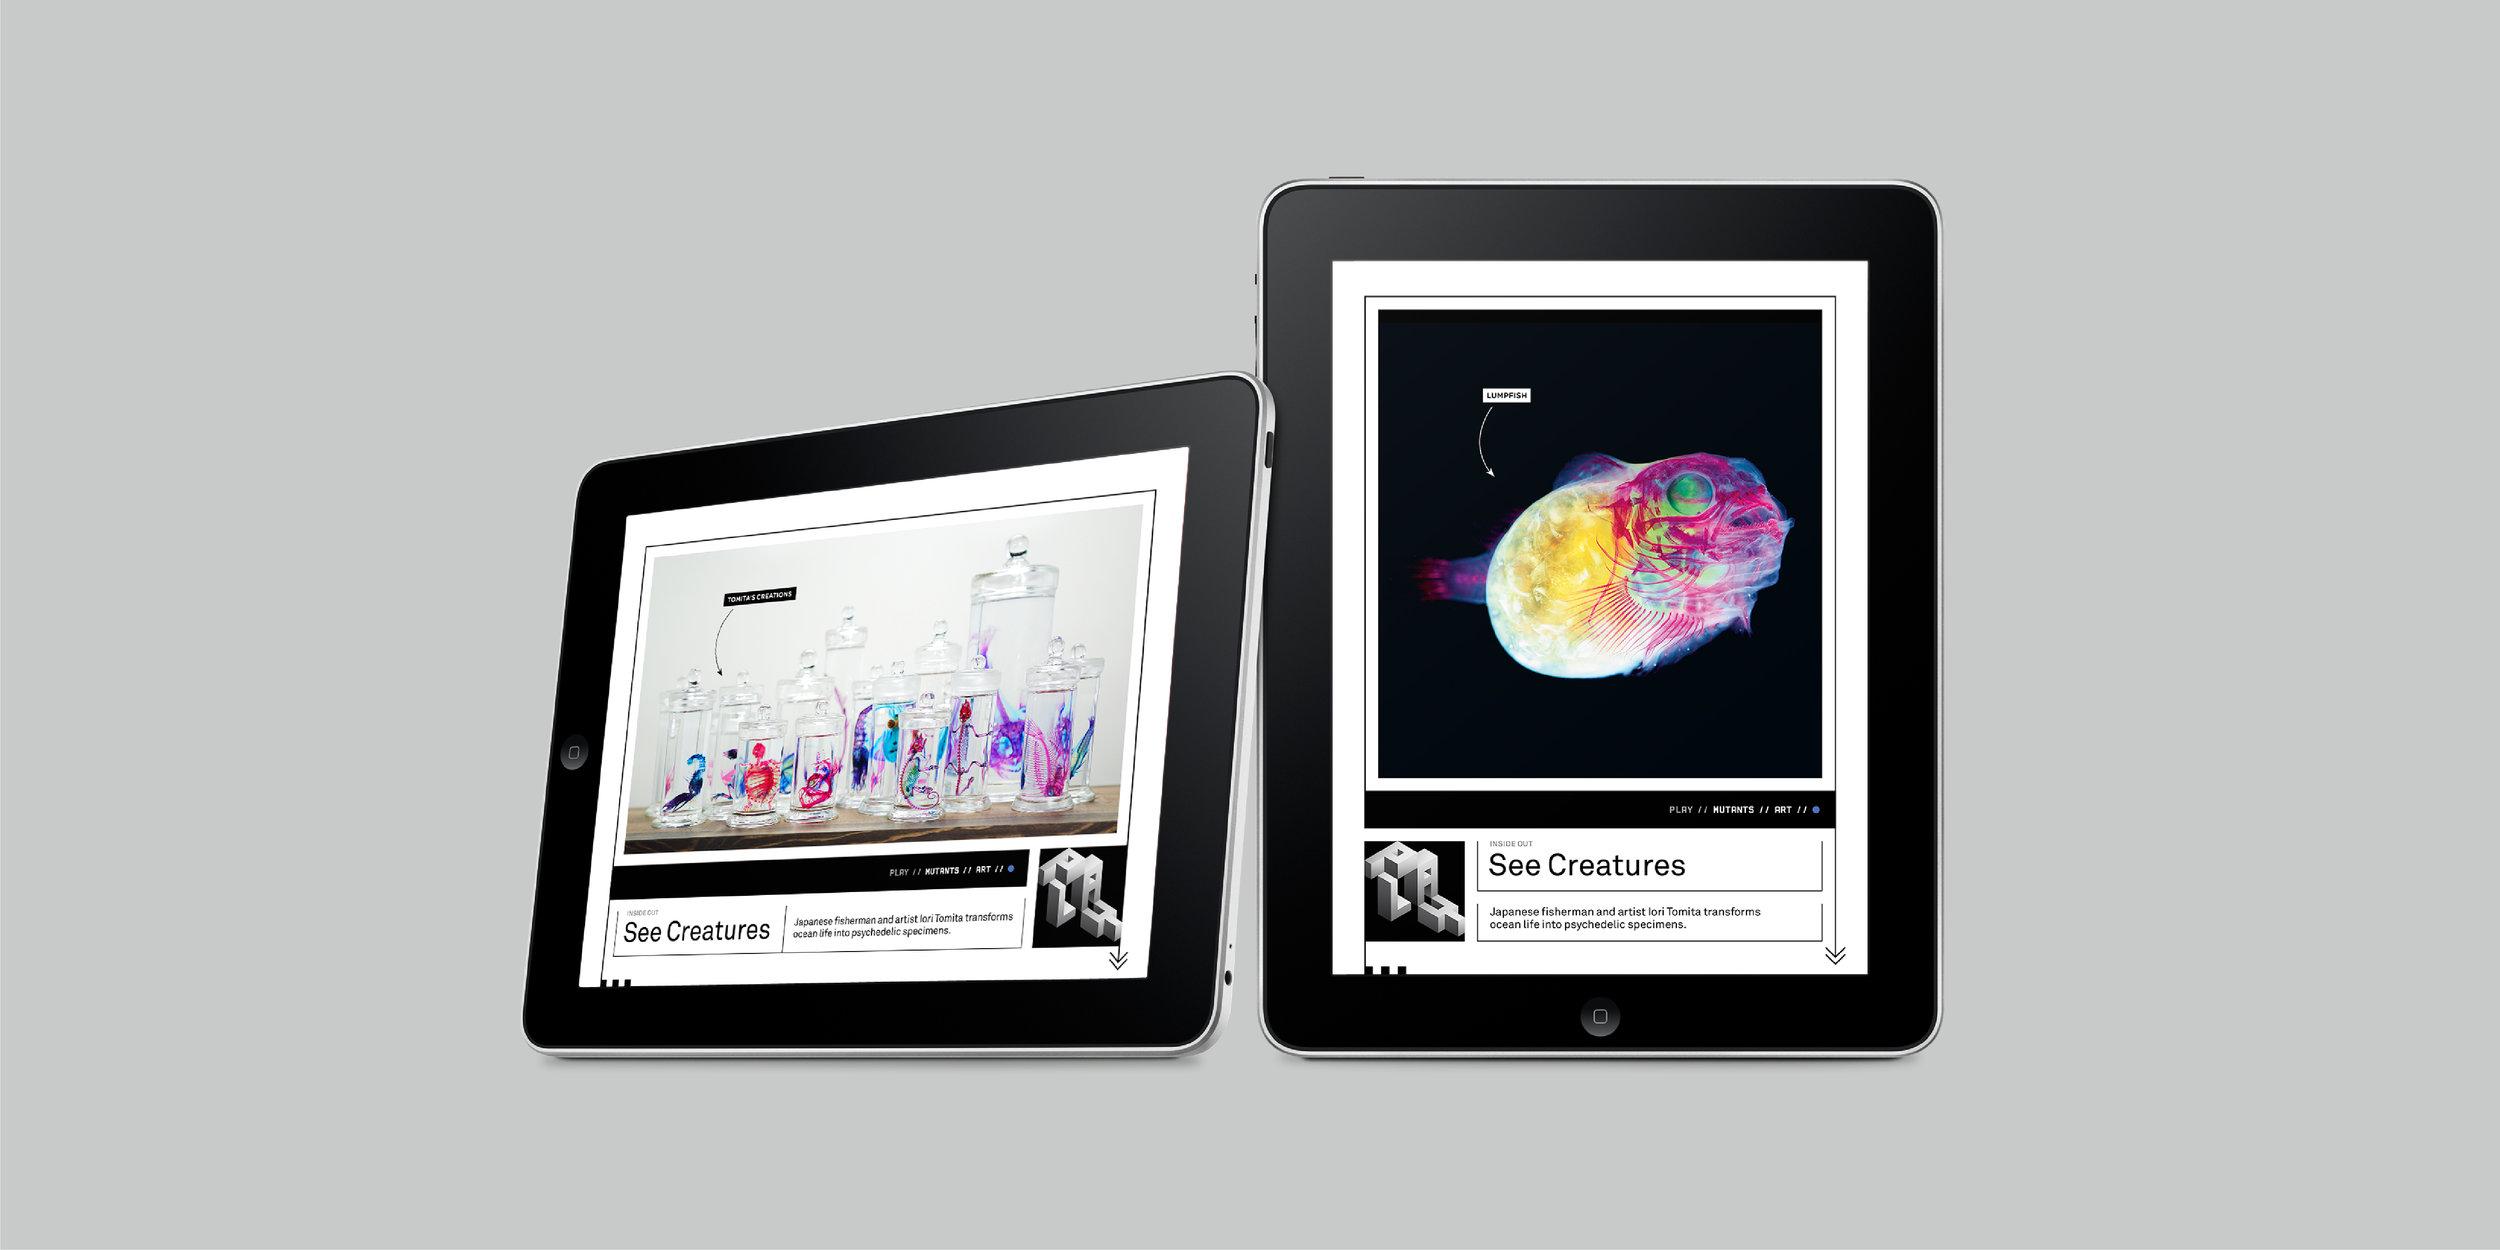 Penny_Lorber_WIRED_iPad_01.jpg